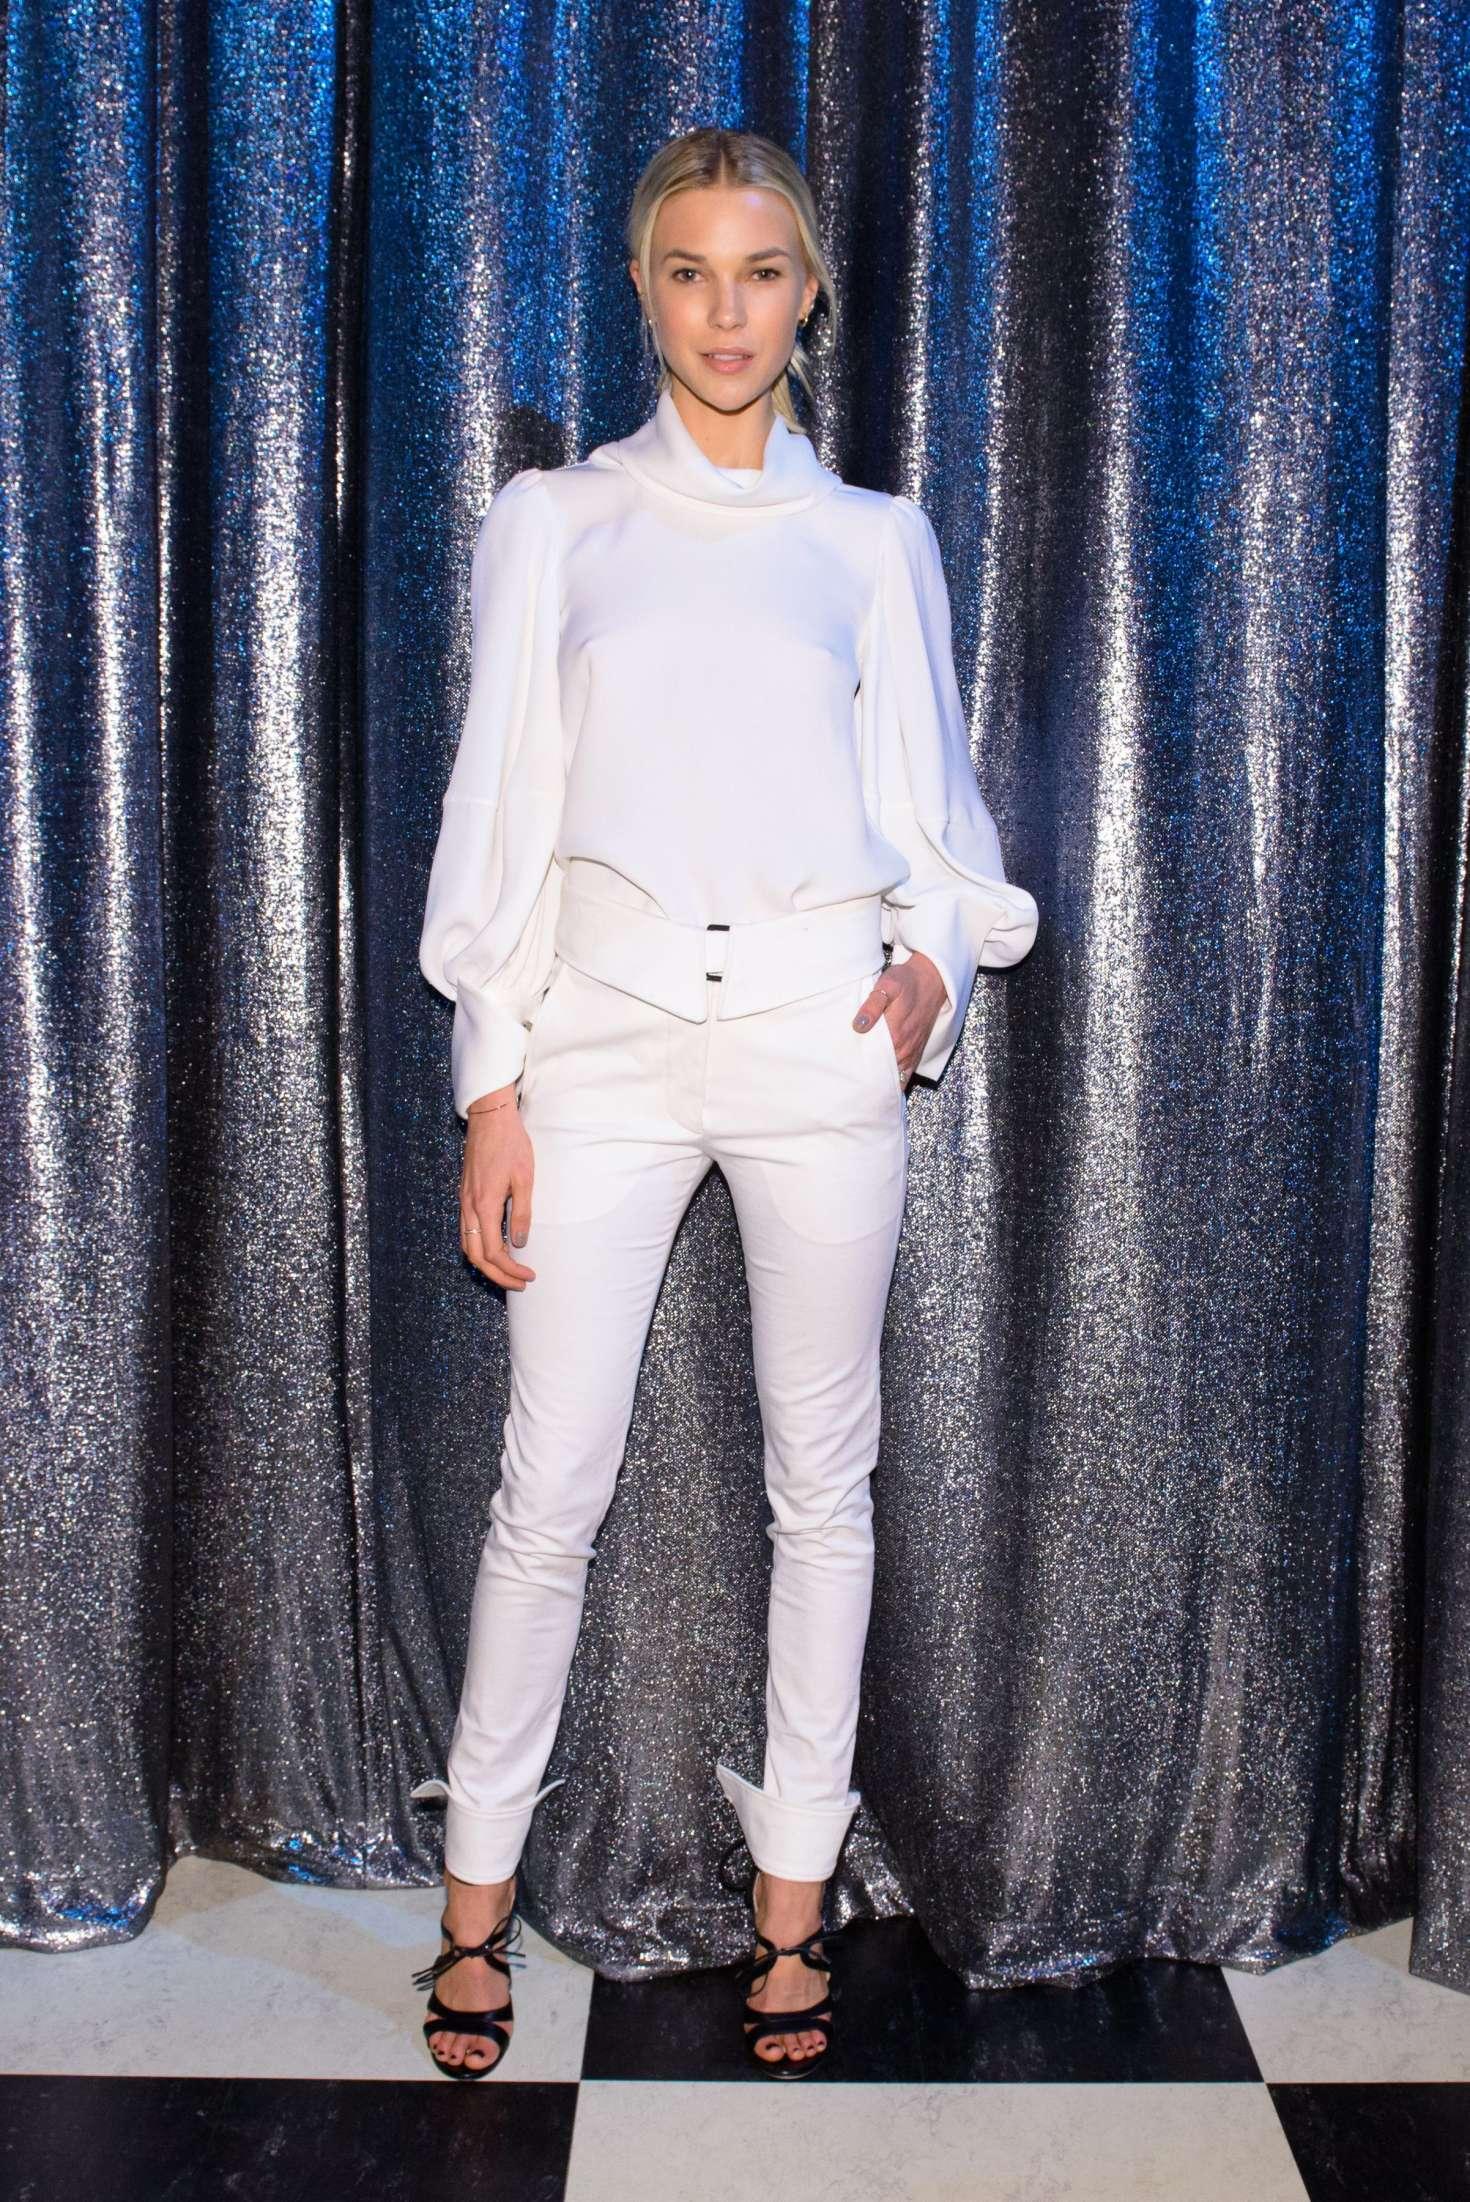 Britt maren oscar de la renta show at 2017 nyfw in new york for Oscar de la renta wallpaper